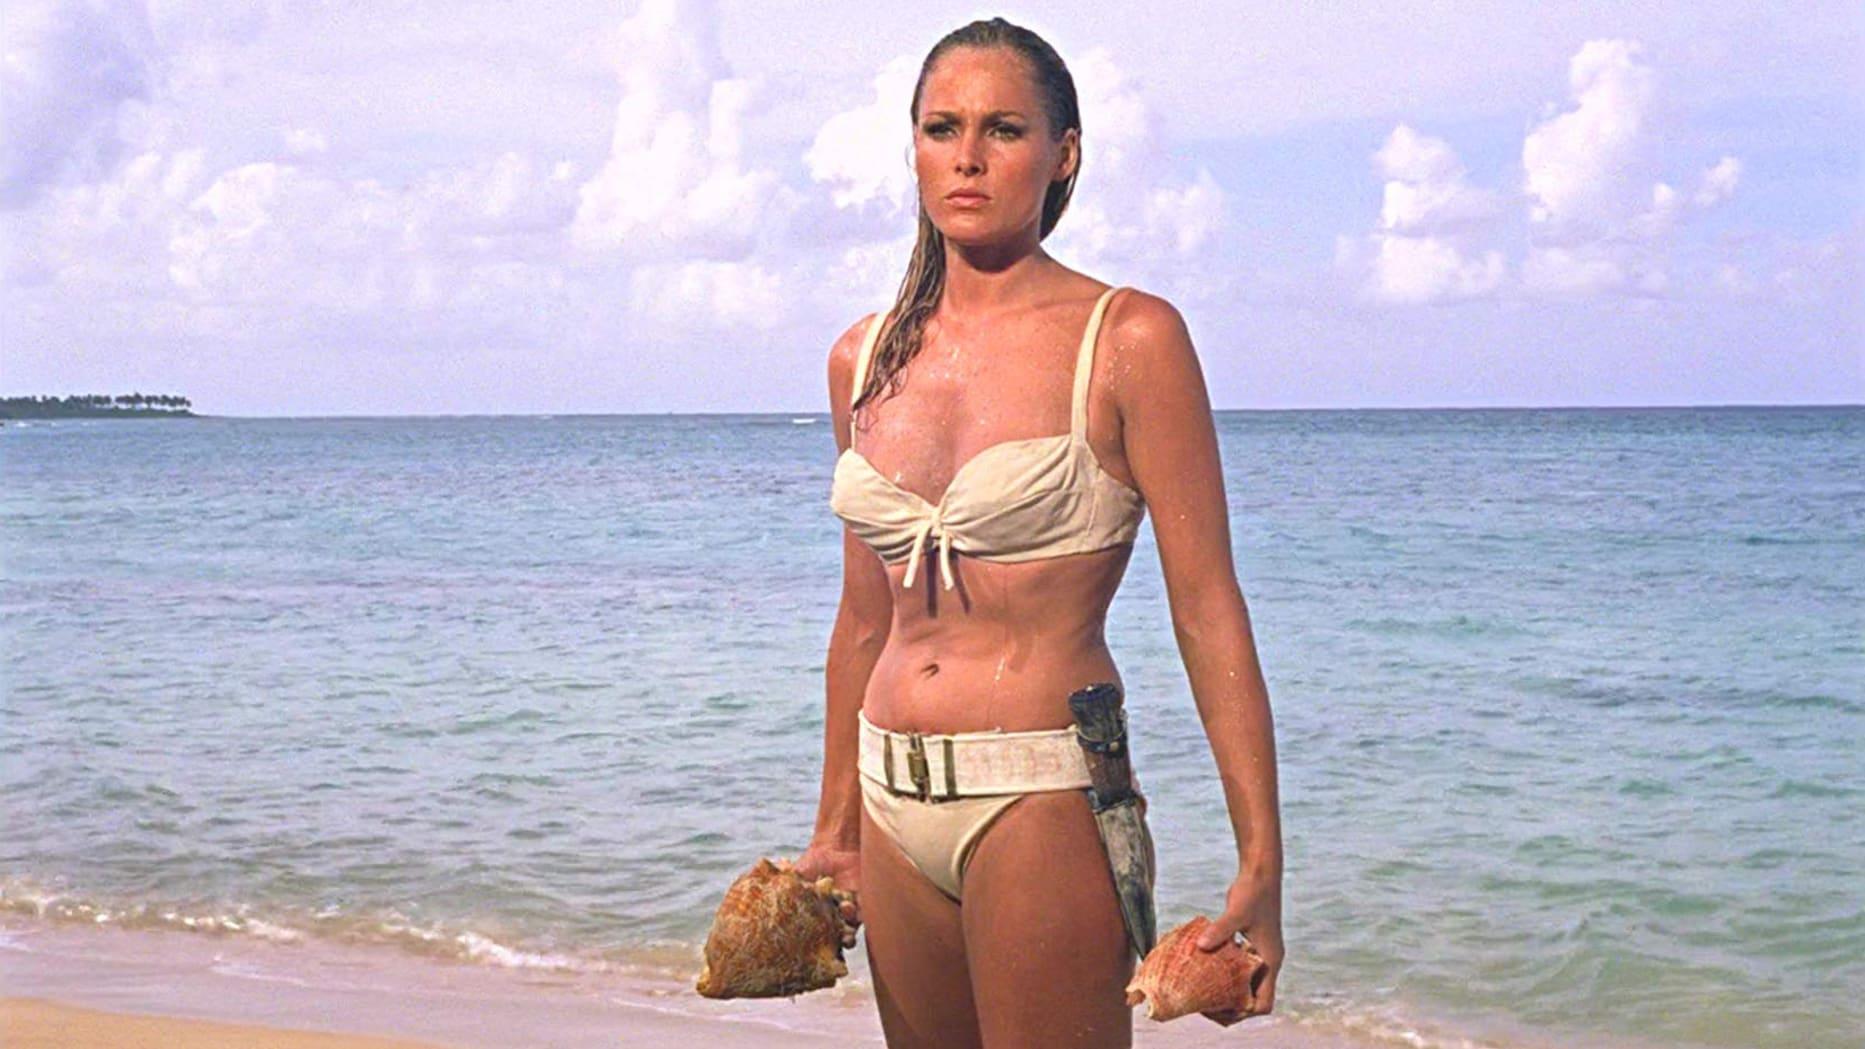 Ursula Andress in Bikini - neomag.